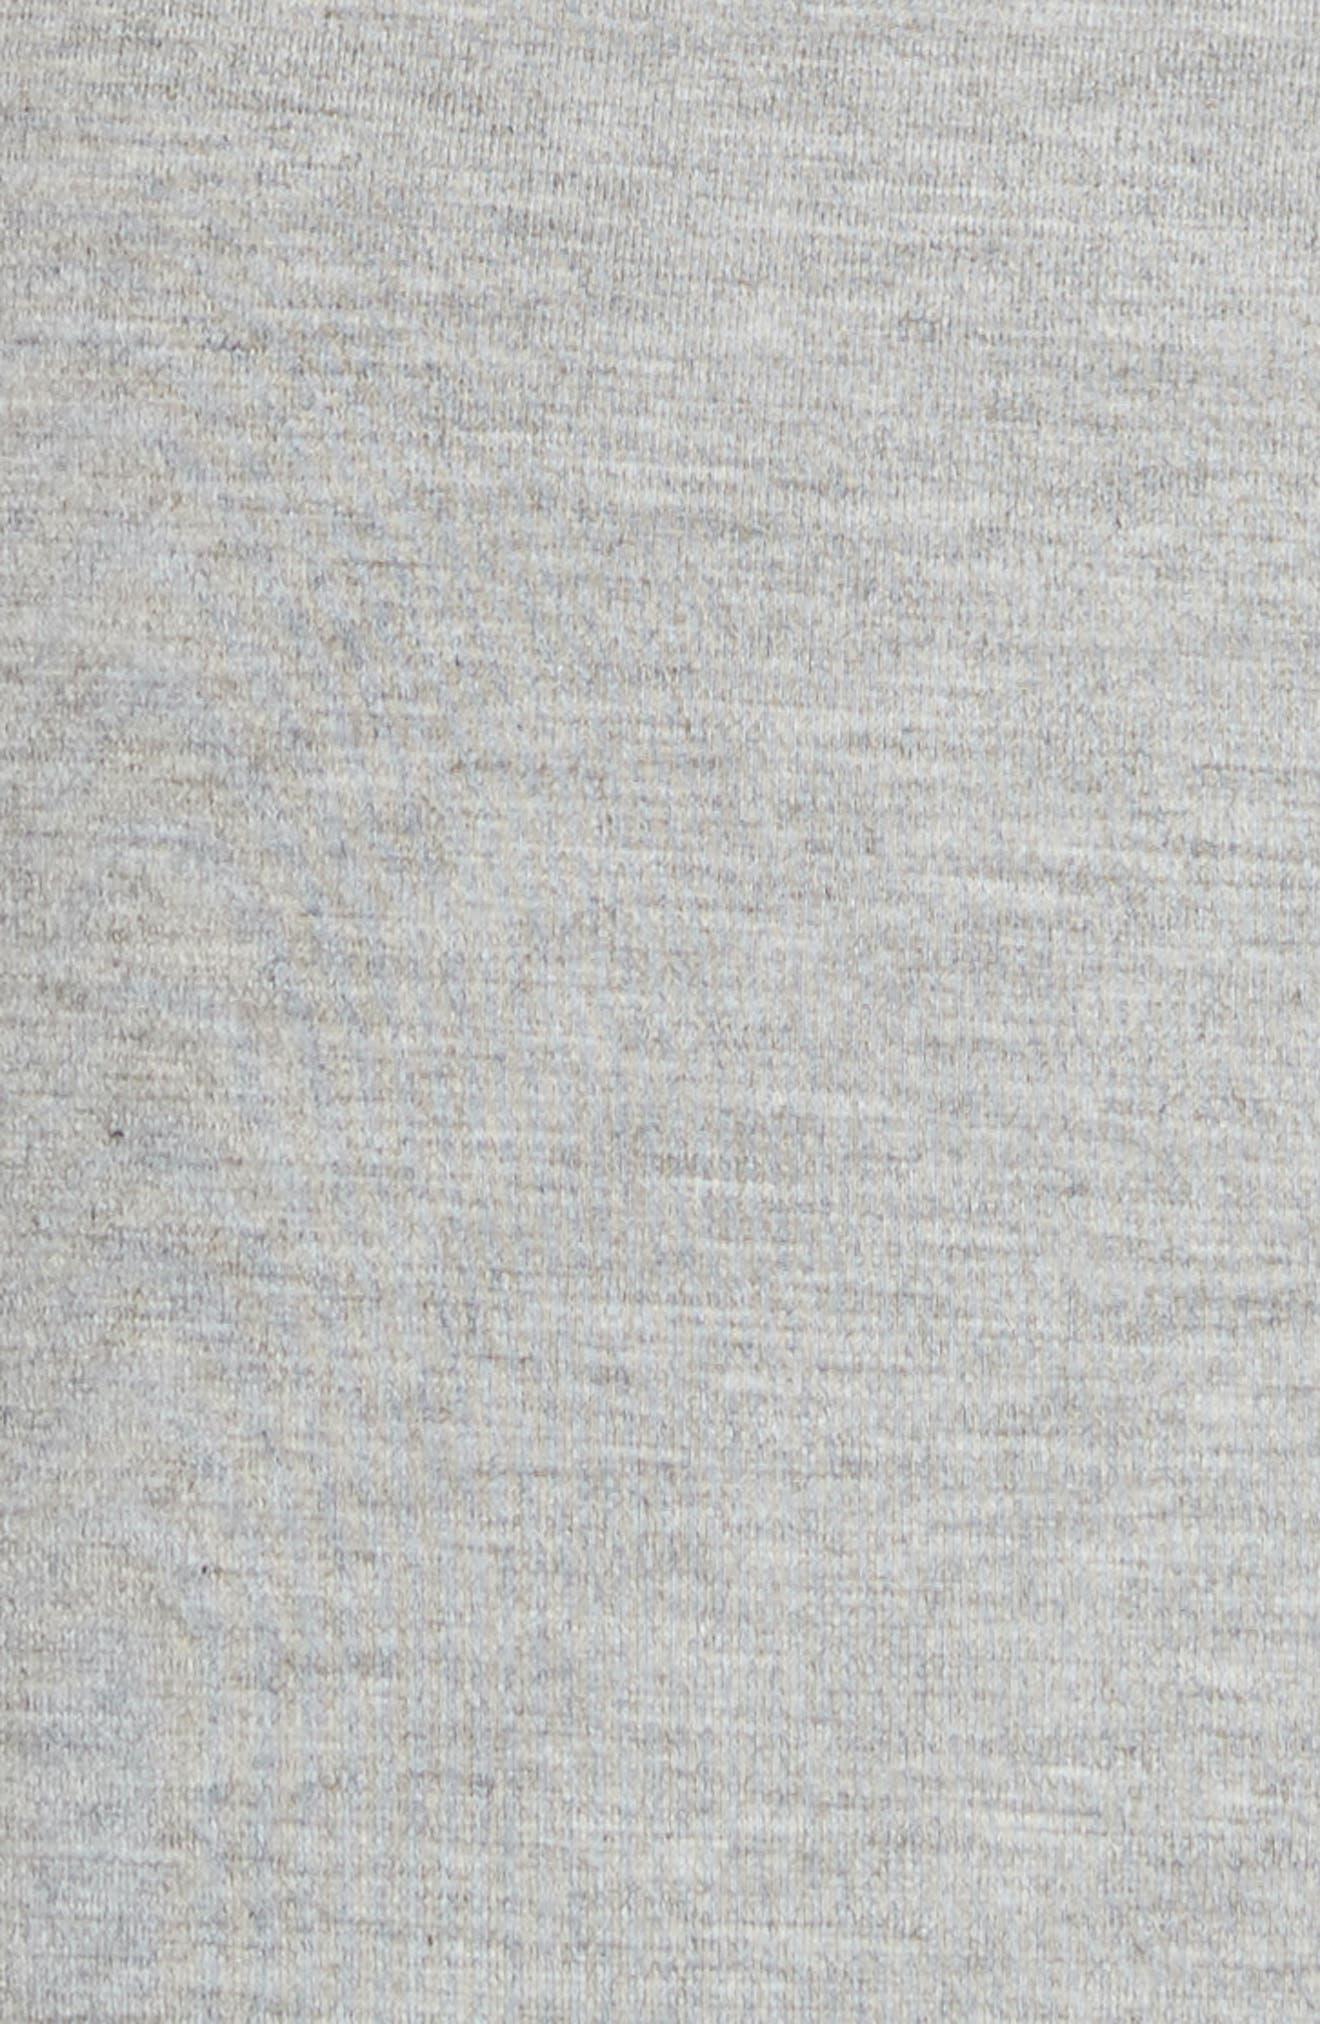 Evalina Tie Front Dress,                             Alternate thumbnail 5, color,                             Grey Marl